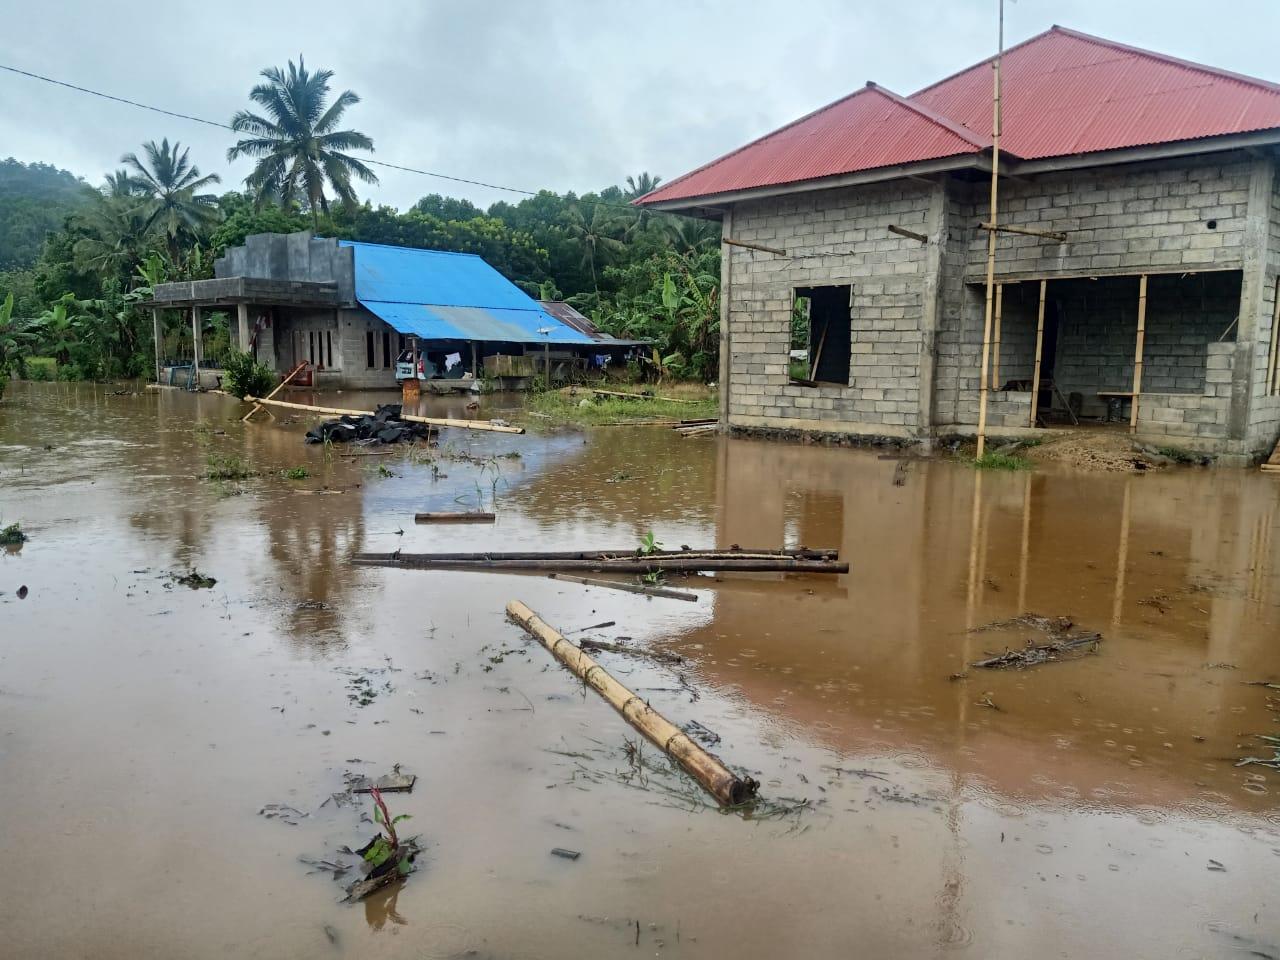 Banjir di Kecamatan Remboken, Kaawoan Minta PU Provinsi Sulut Tinjau Plat Duiker